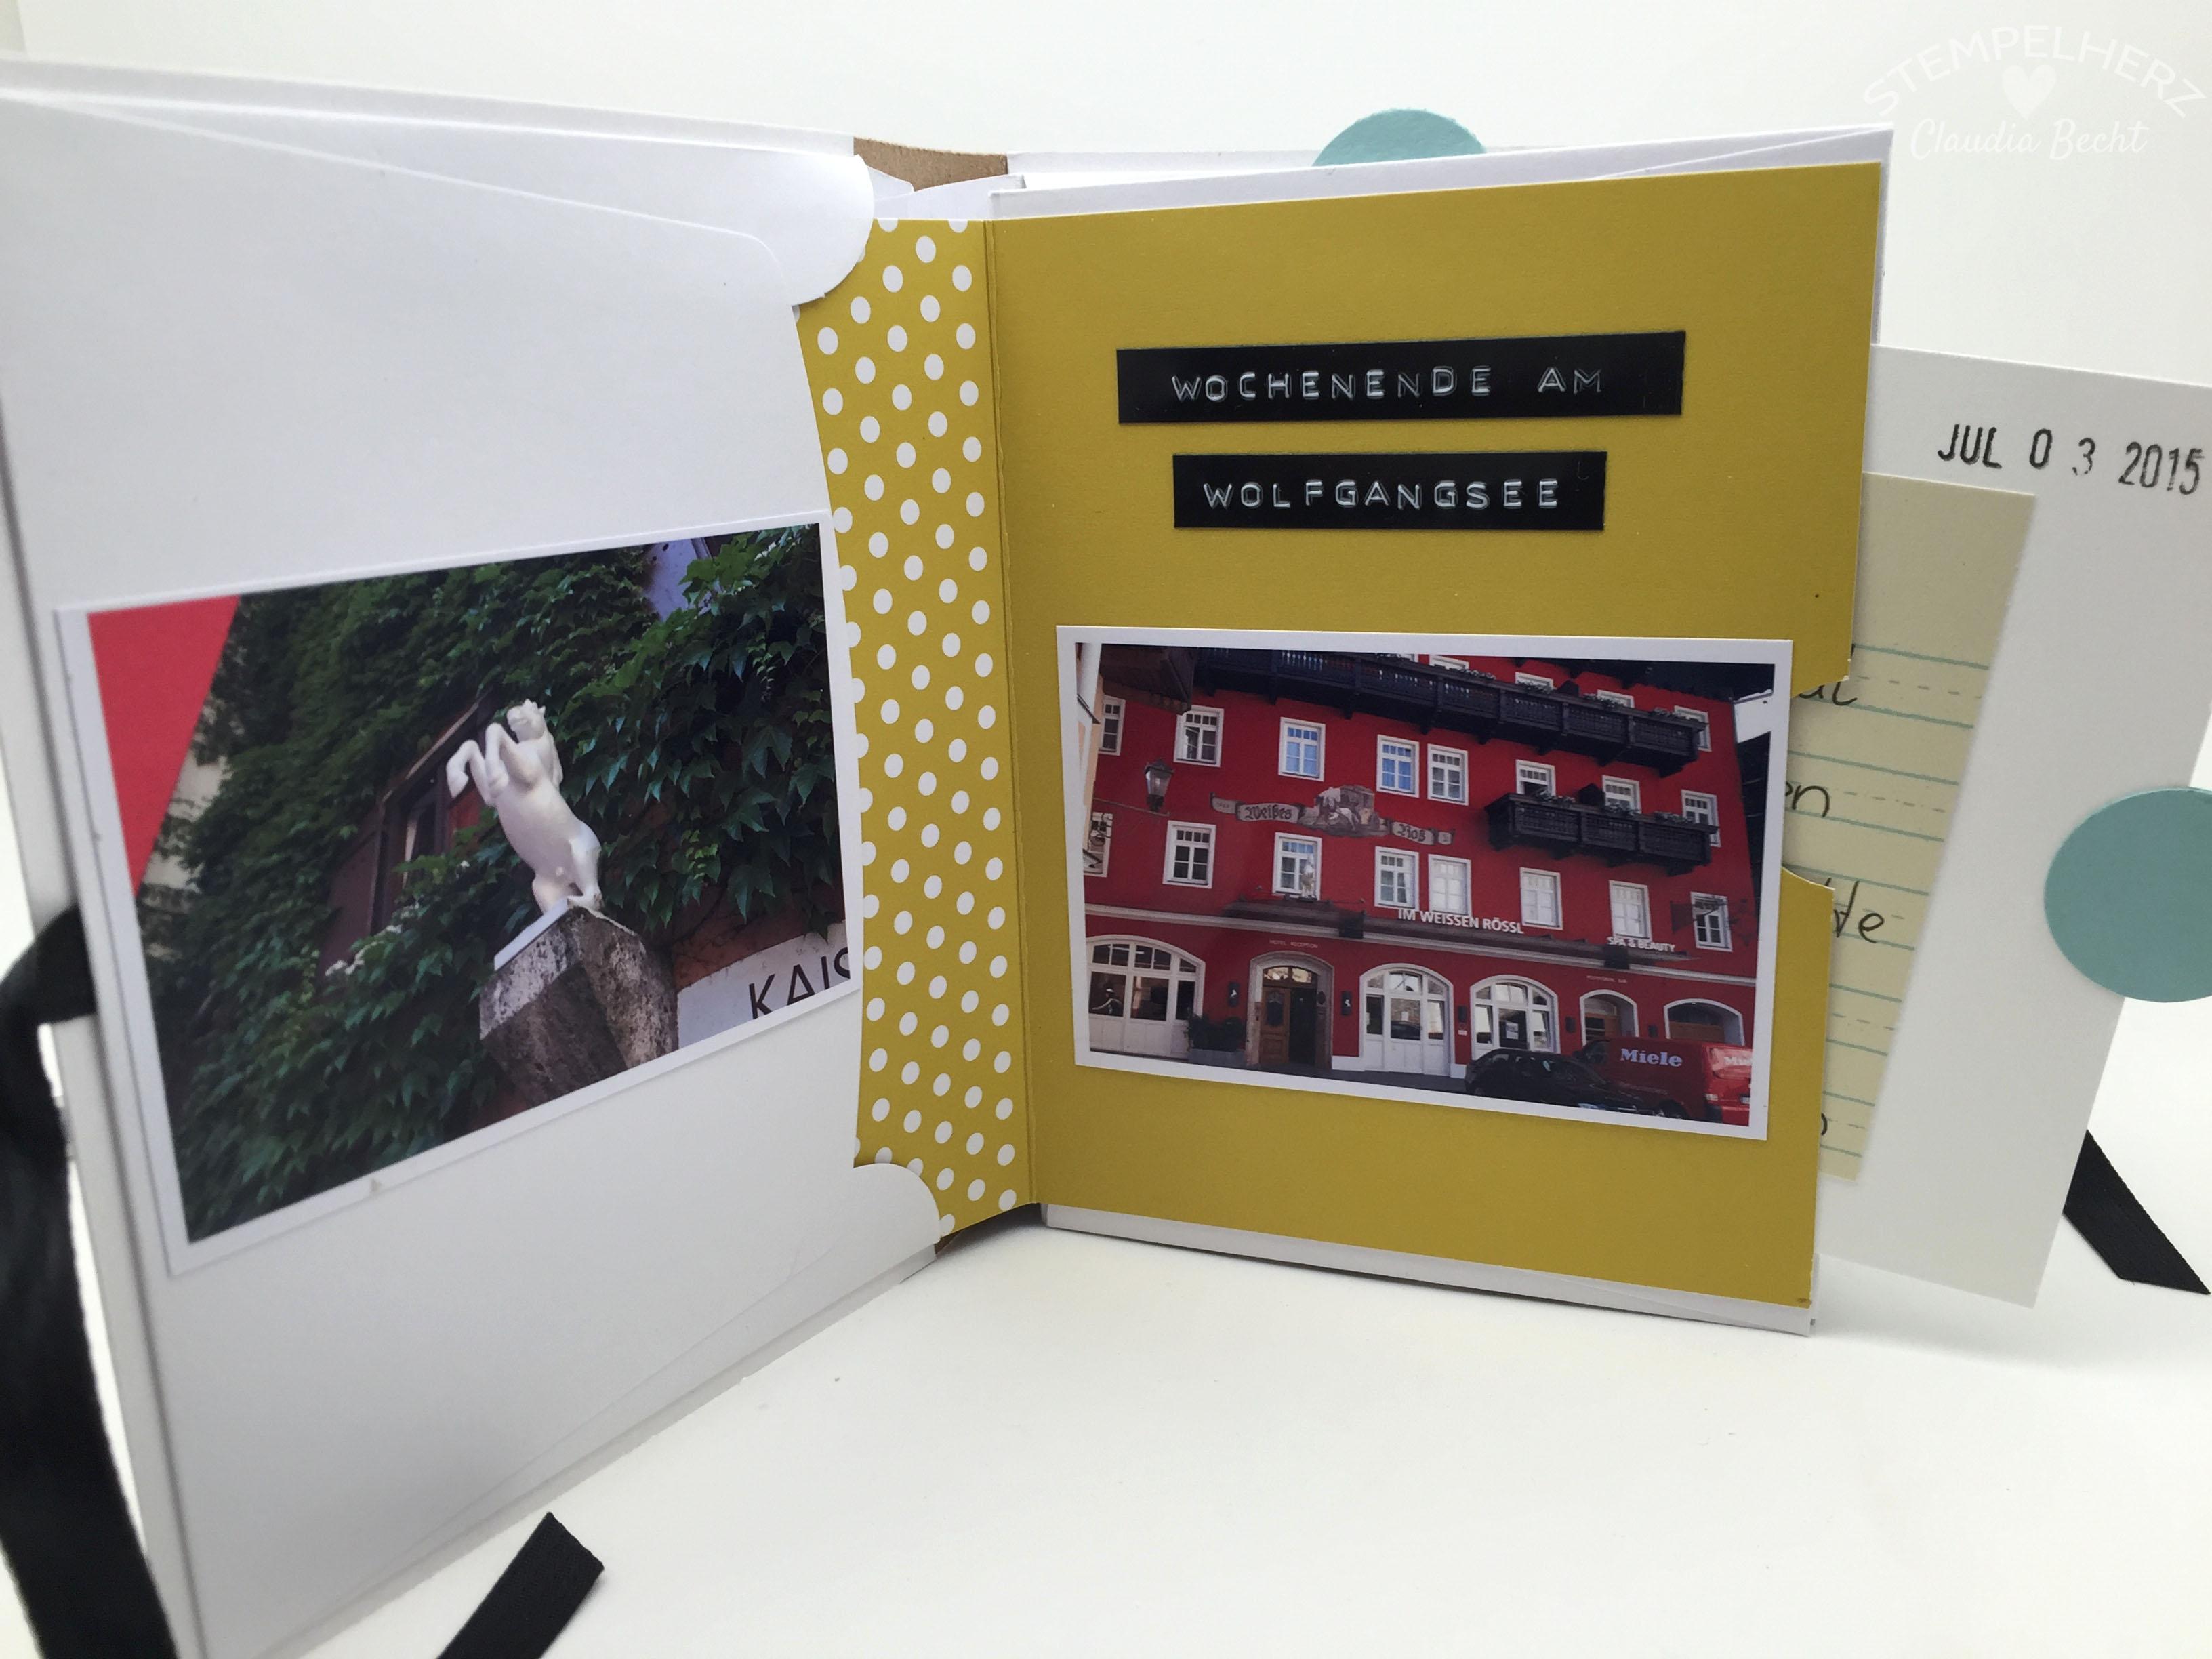 Stampin Up-Stempelherz-Album-Minibook-Minialbum Wolfgangsee 07